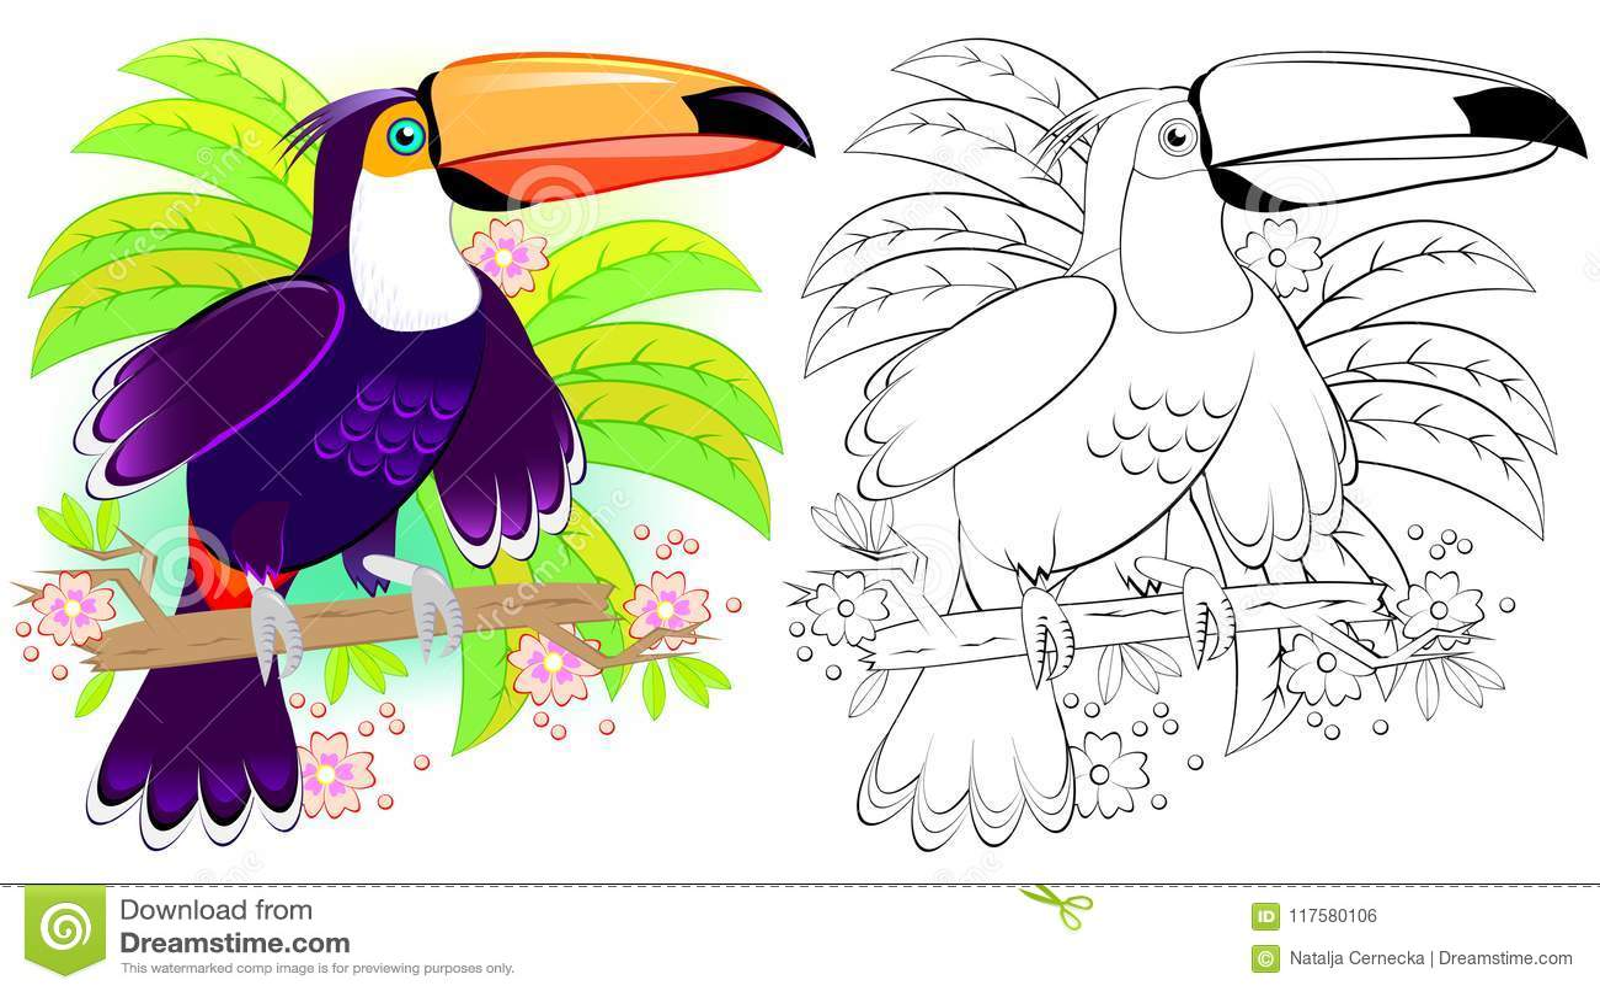 Teste Padrao Colorido E Preto E Branco Para Colorir Ilustracao Do